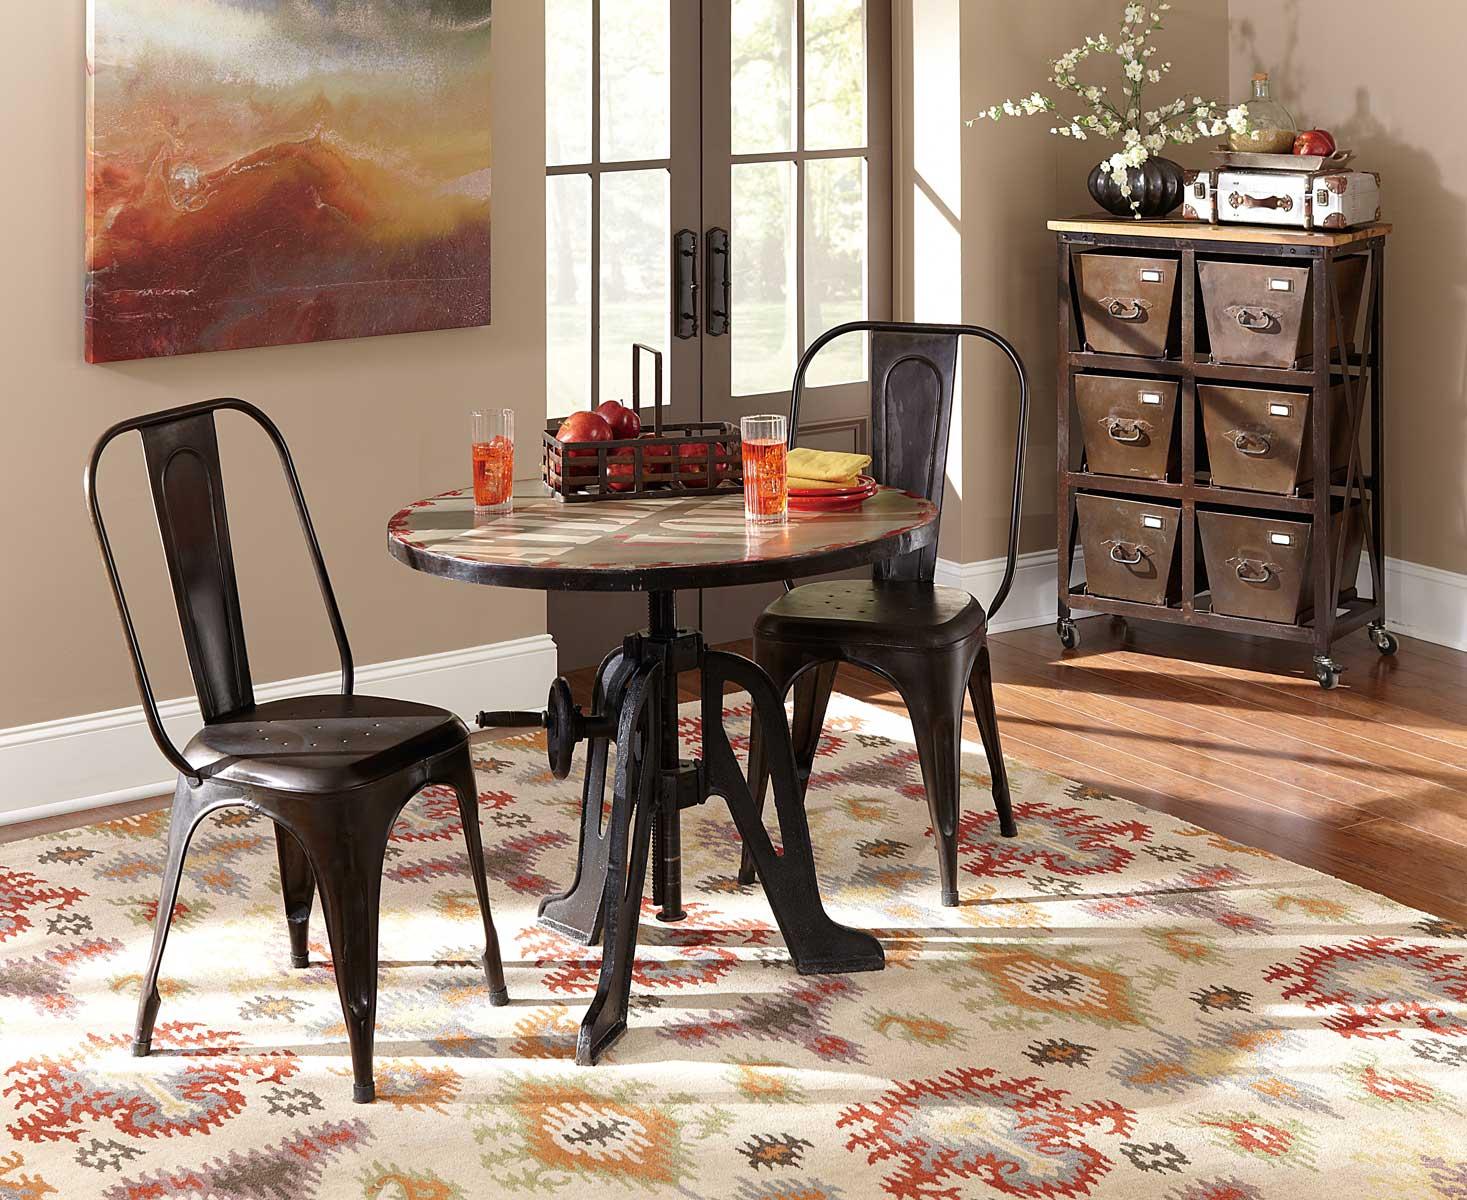 Homelegance Amara Iron Lift-Top Table Dining Set